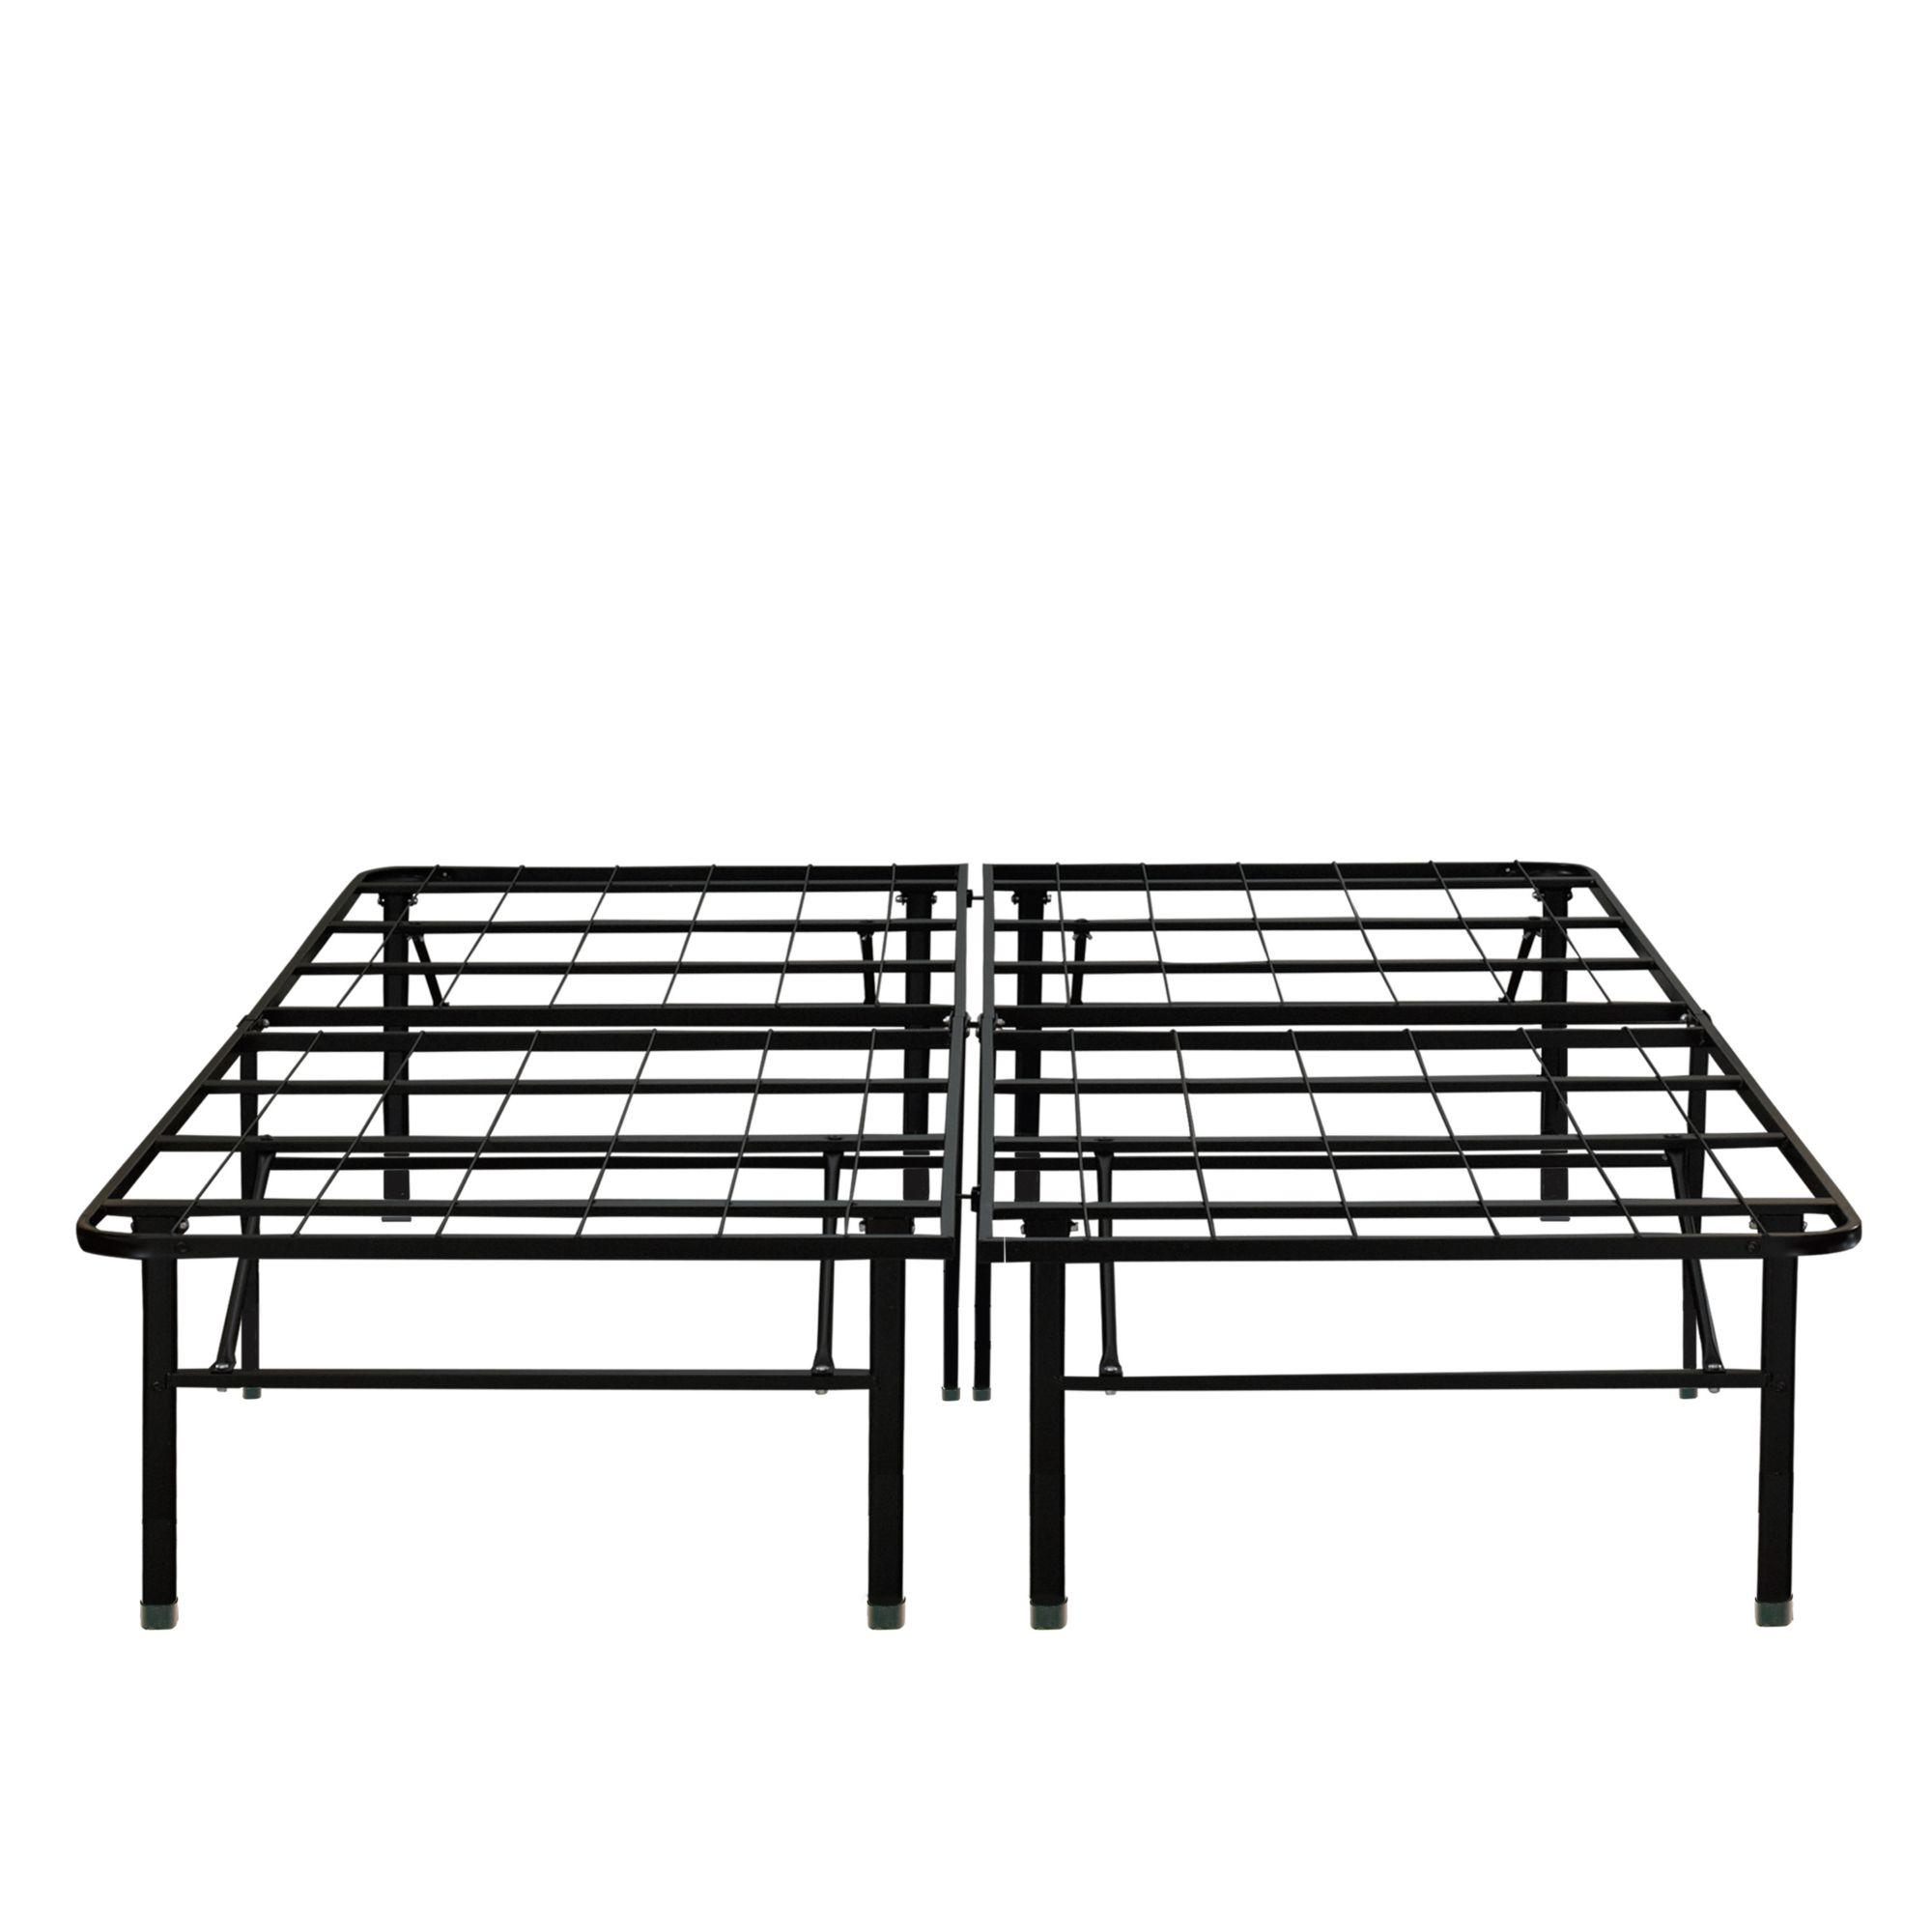 18 Contour Rest Dream Support King Size Bed Frame Black Bjs Wholesale Club